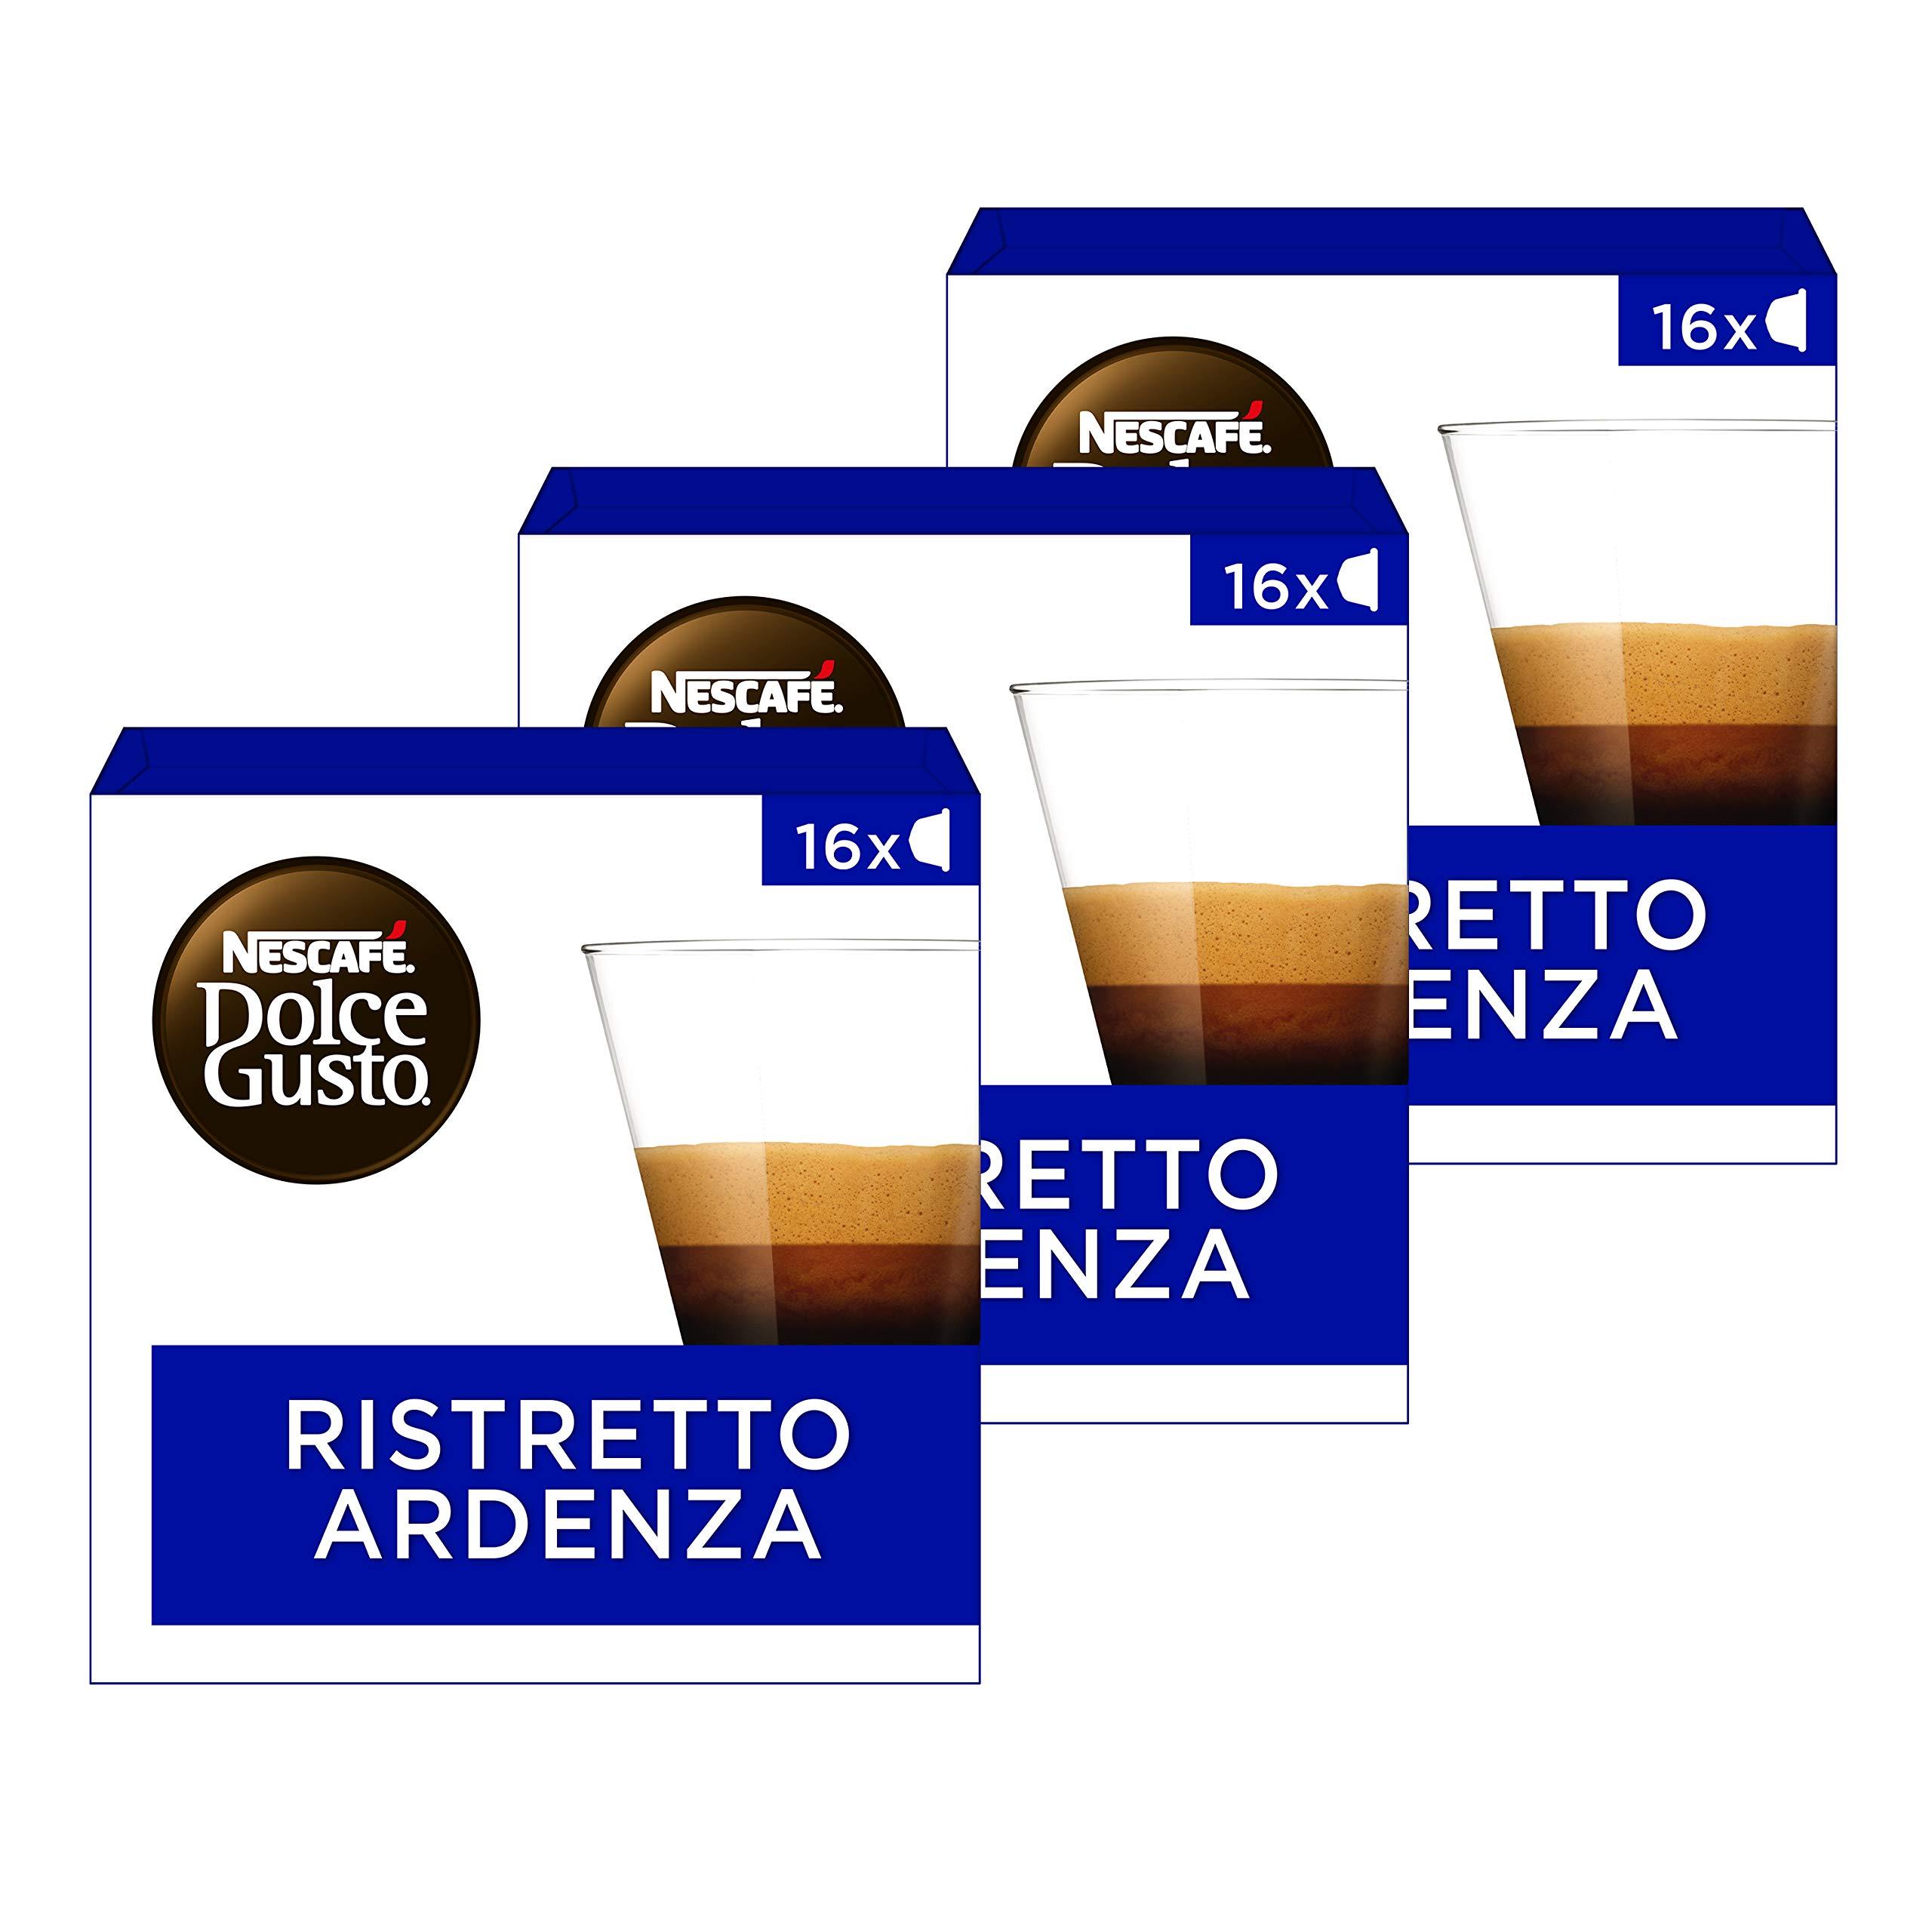 Nescafé Dolce Gusto Espresso Ristretto Ardenza, 3 Pack, Strong, 3 x 16 Coffee Capsules, 48 Servings Combined